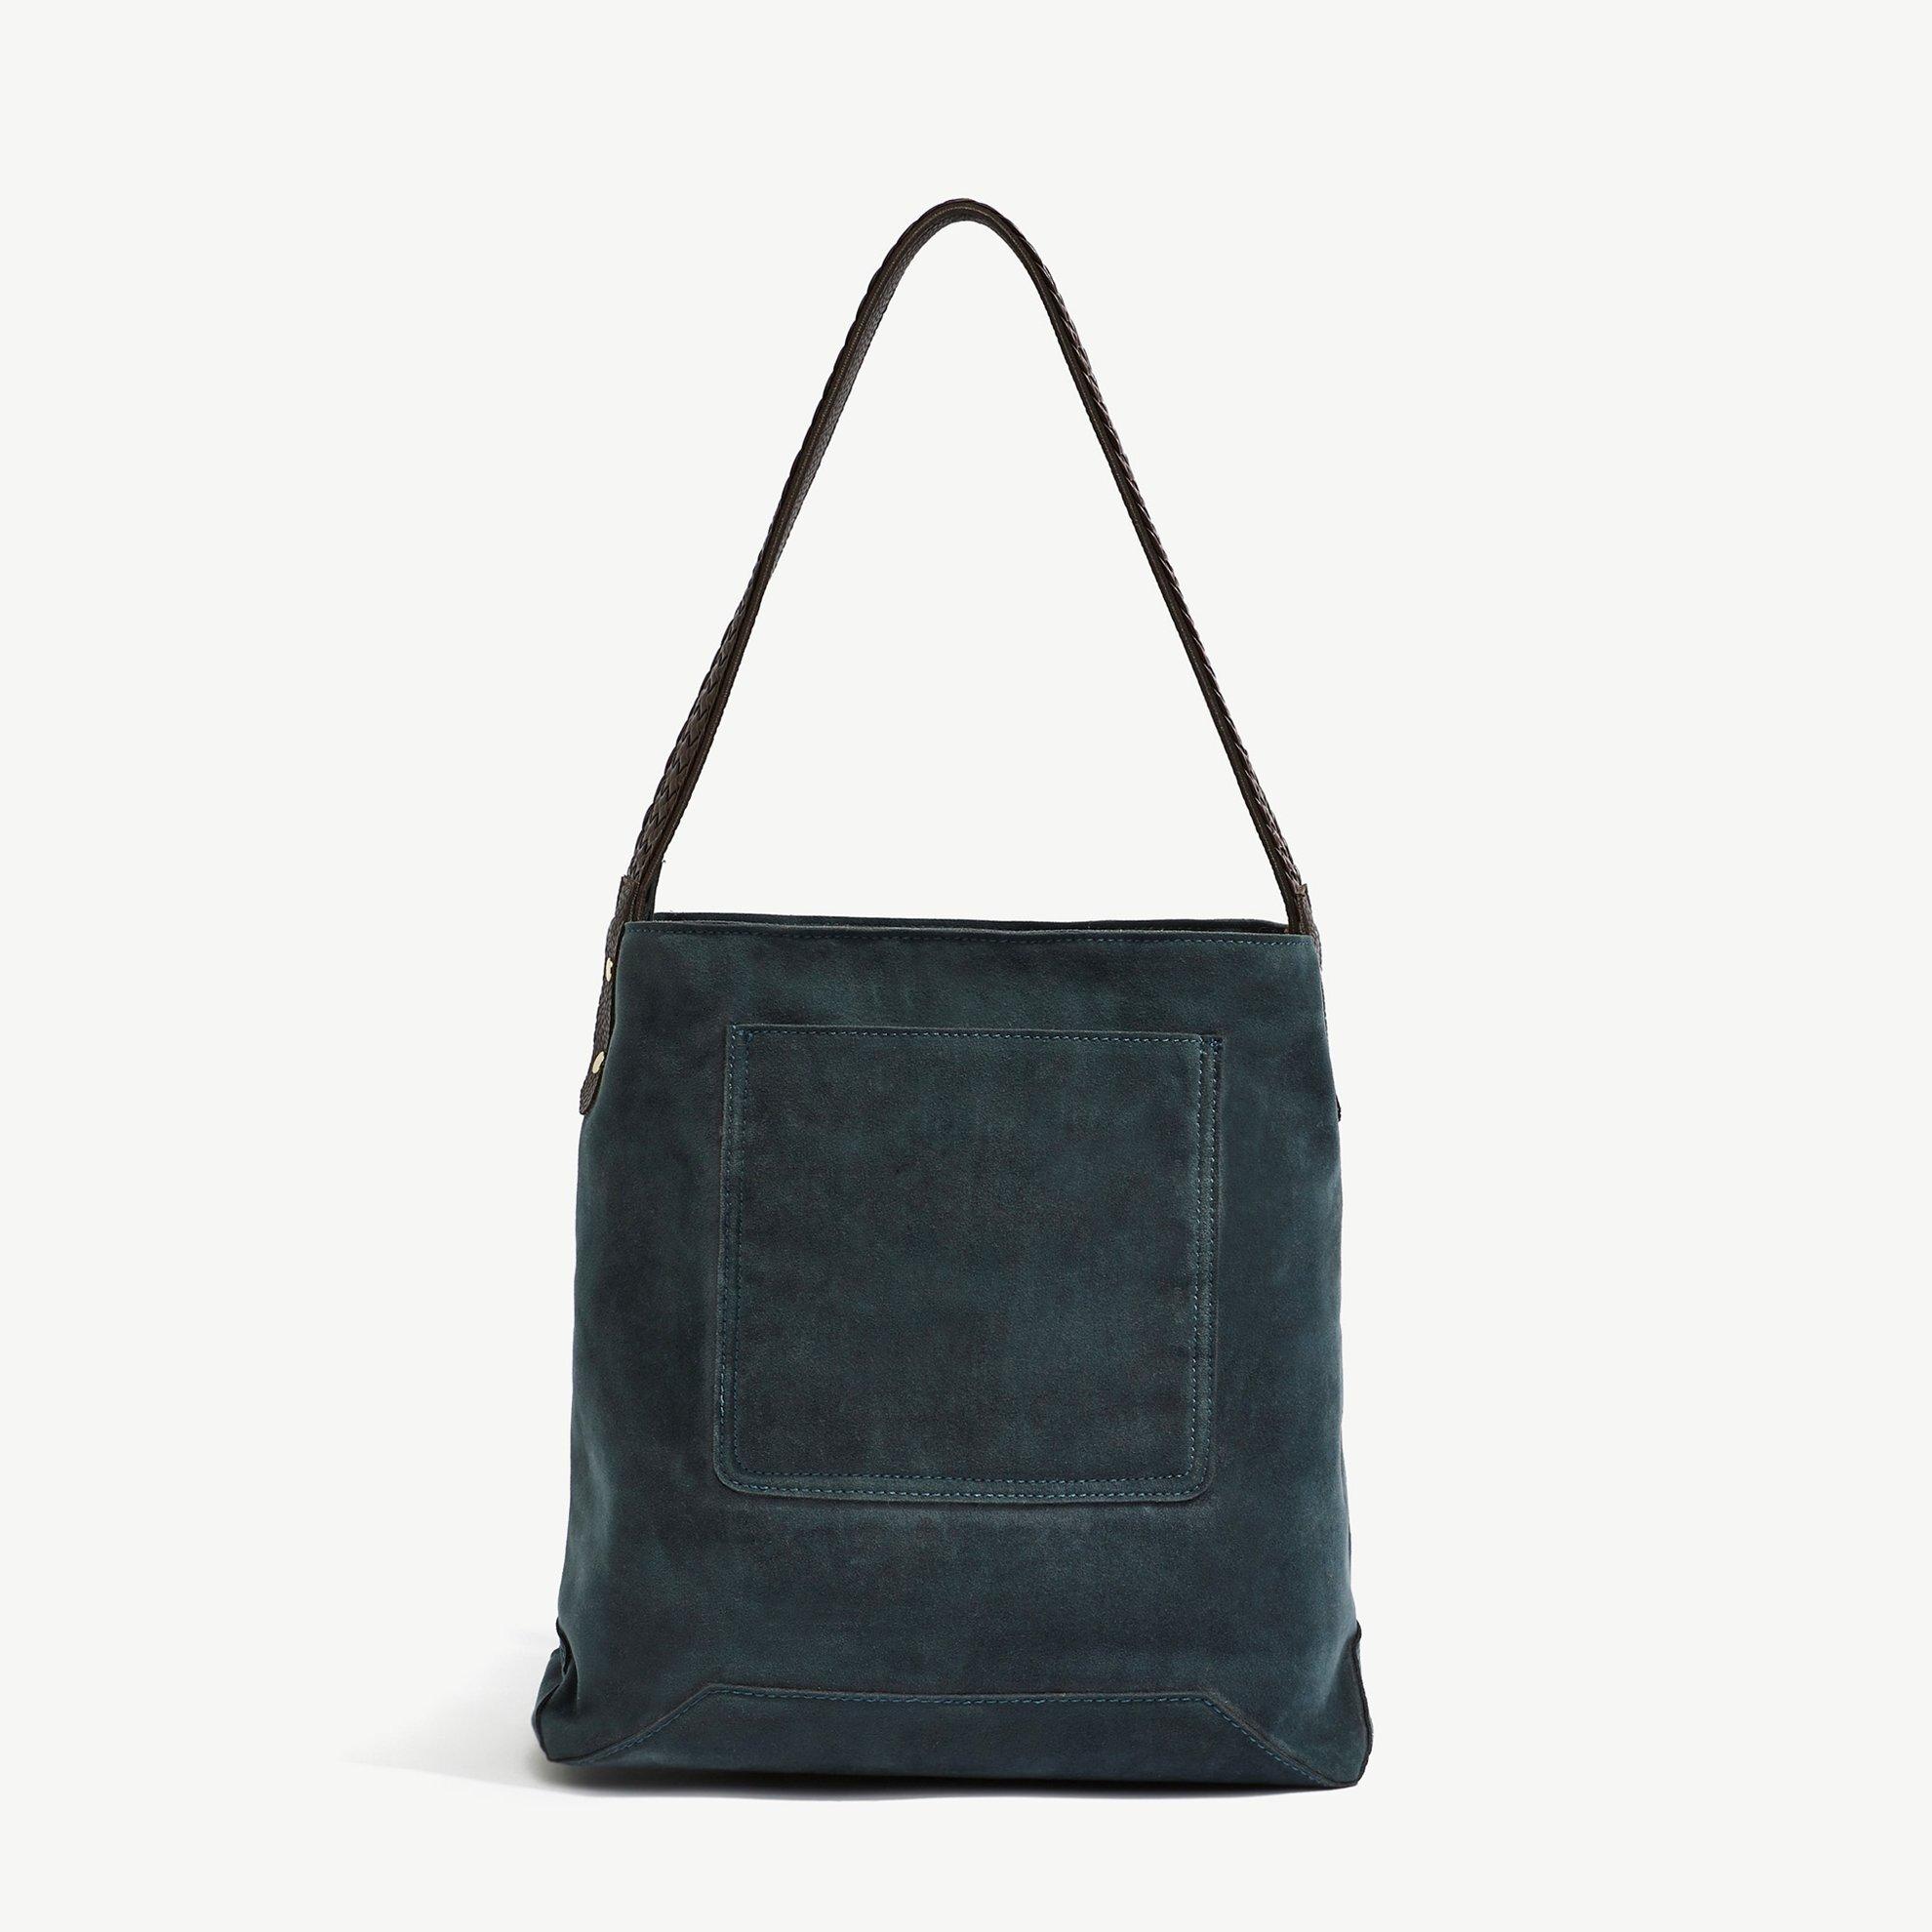 89b111f1a9cca Handtasche  Handtasche  Handtasche  Handtasche